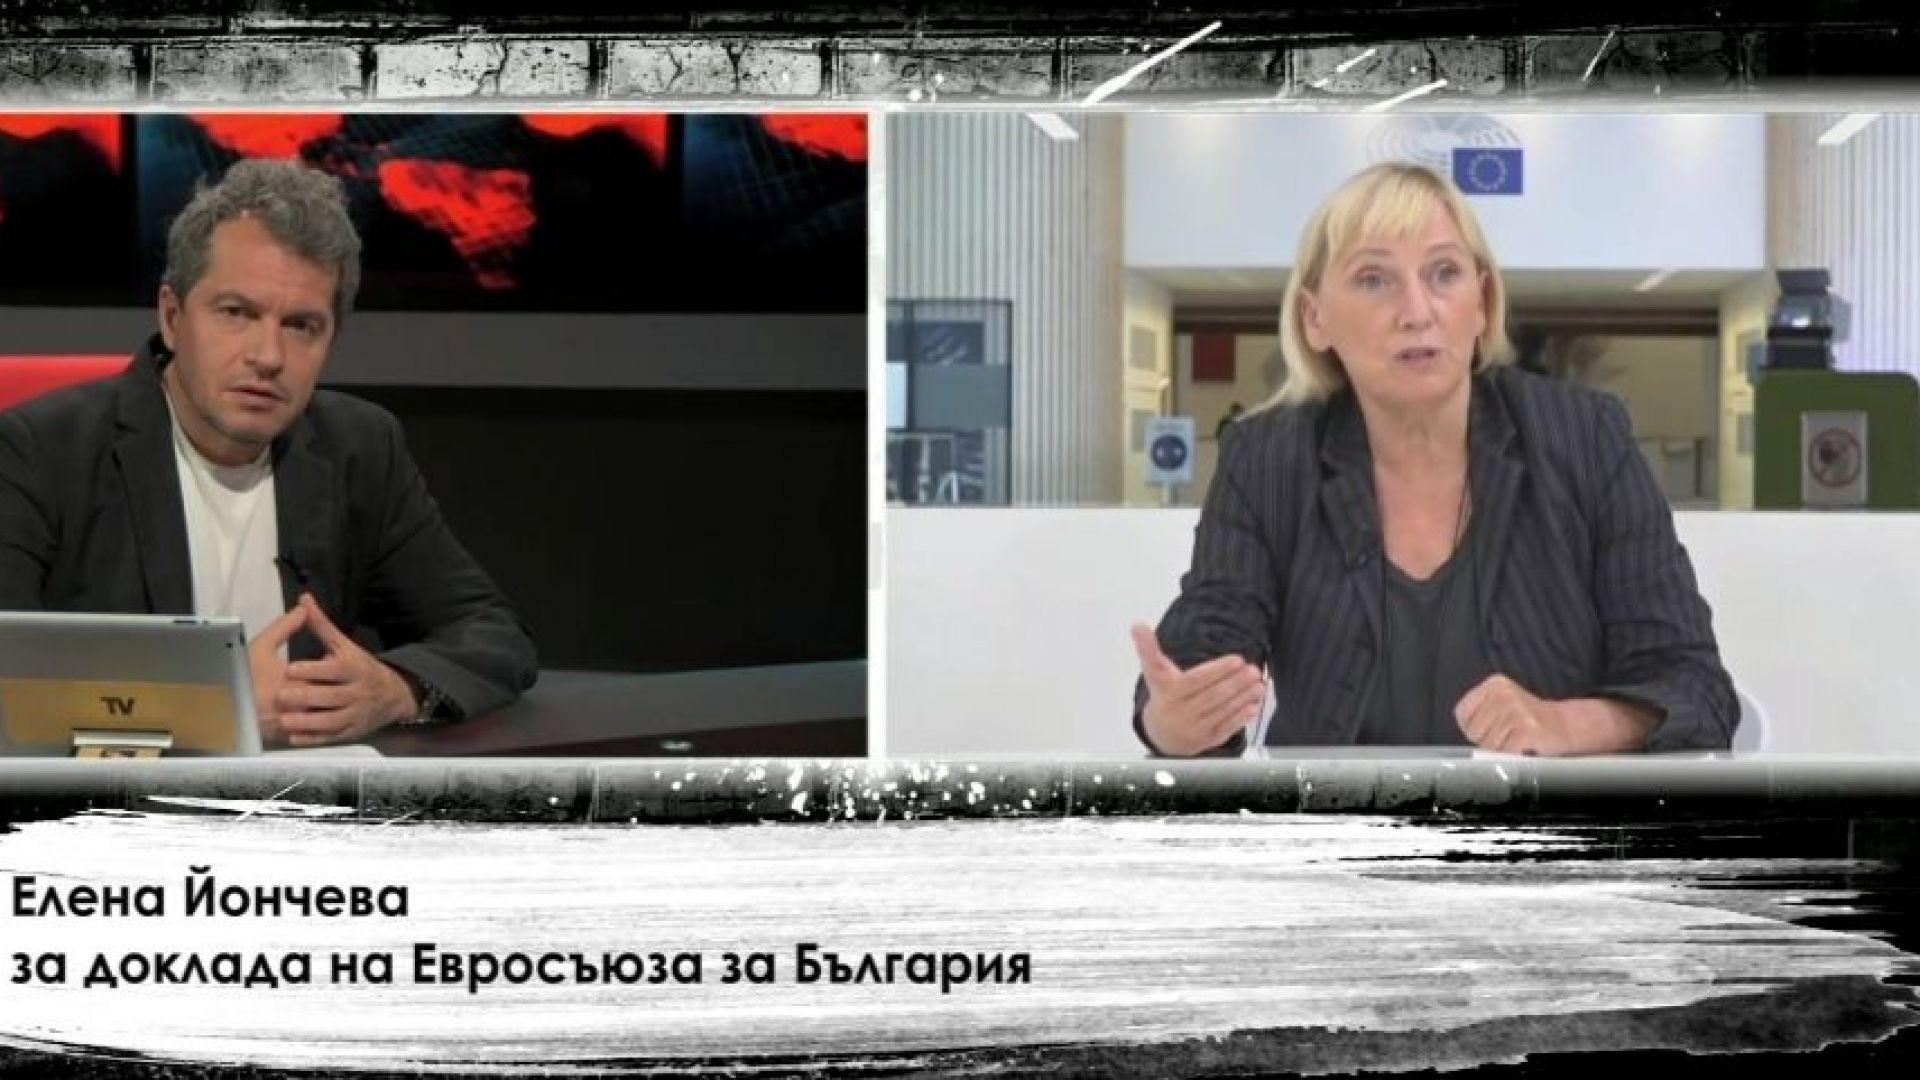 Елена Йончева: Има договорка между Корнелия Нинова и Бойко Борисов